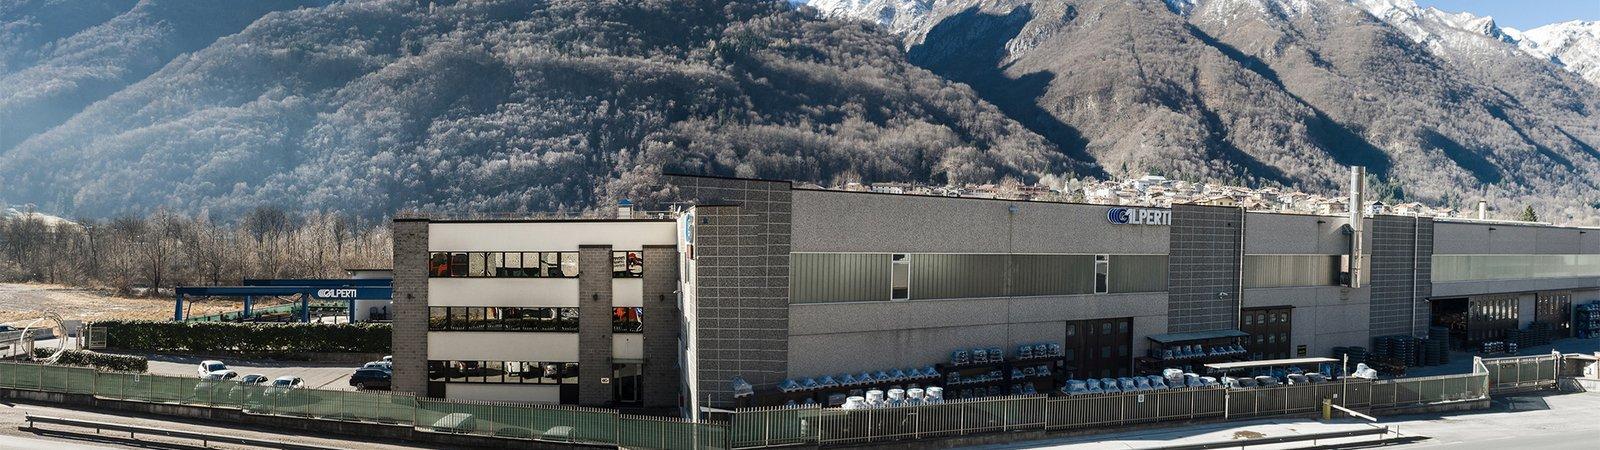 Galperti Steel manufacturing company